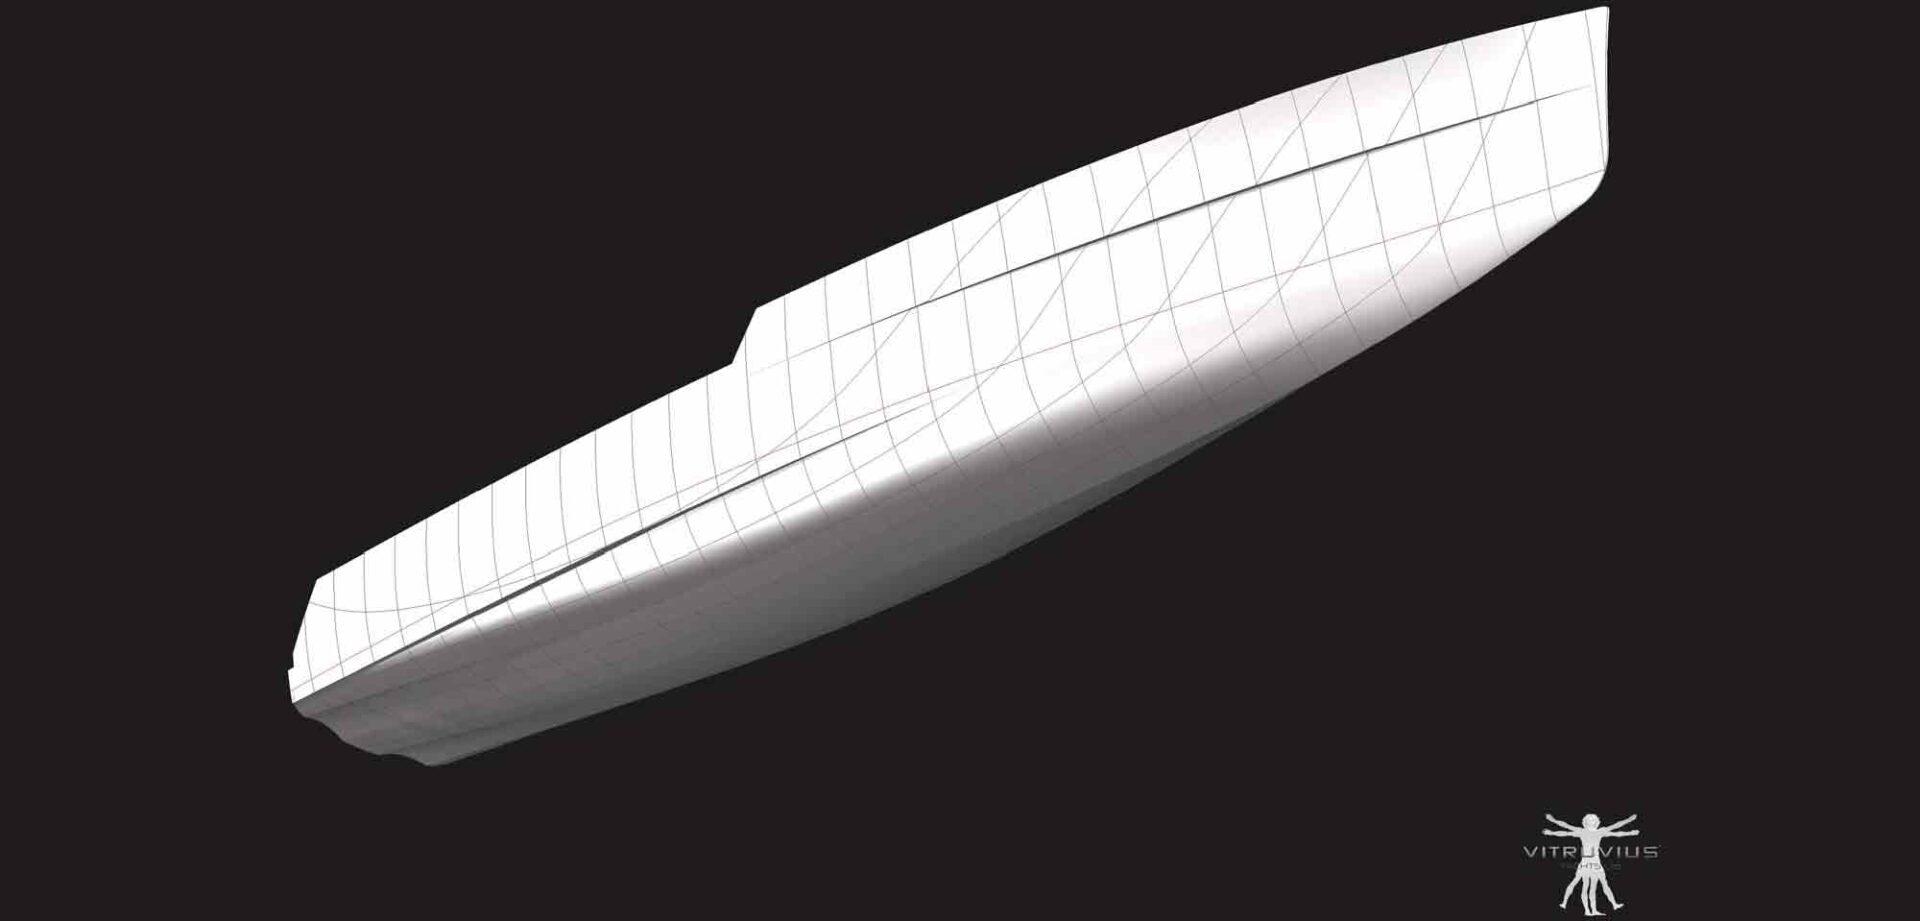 sustainable yacht design - the optimised bow